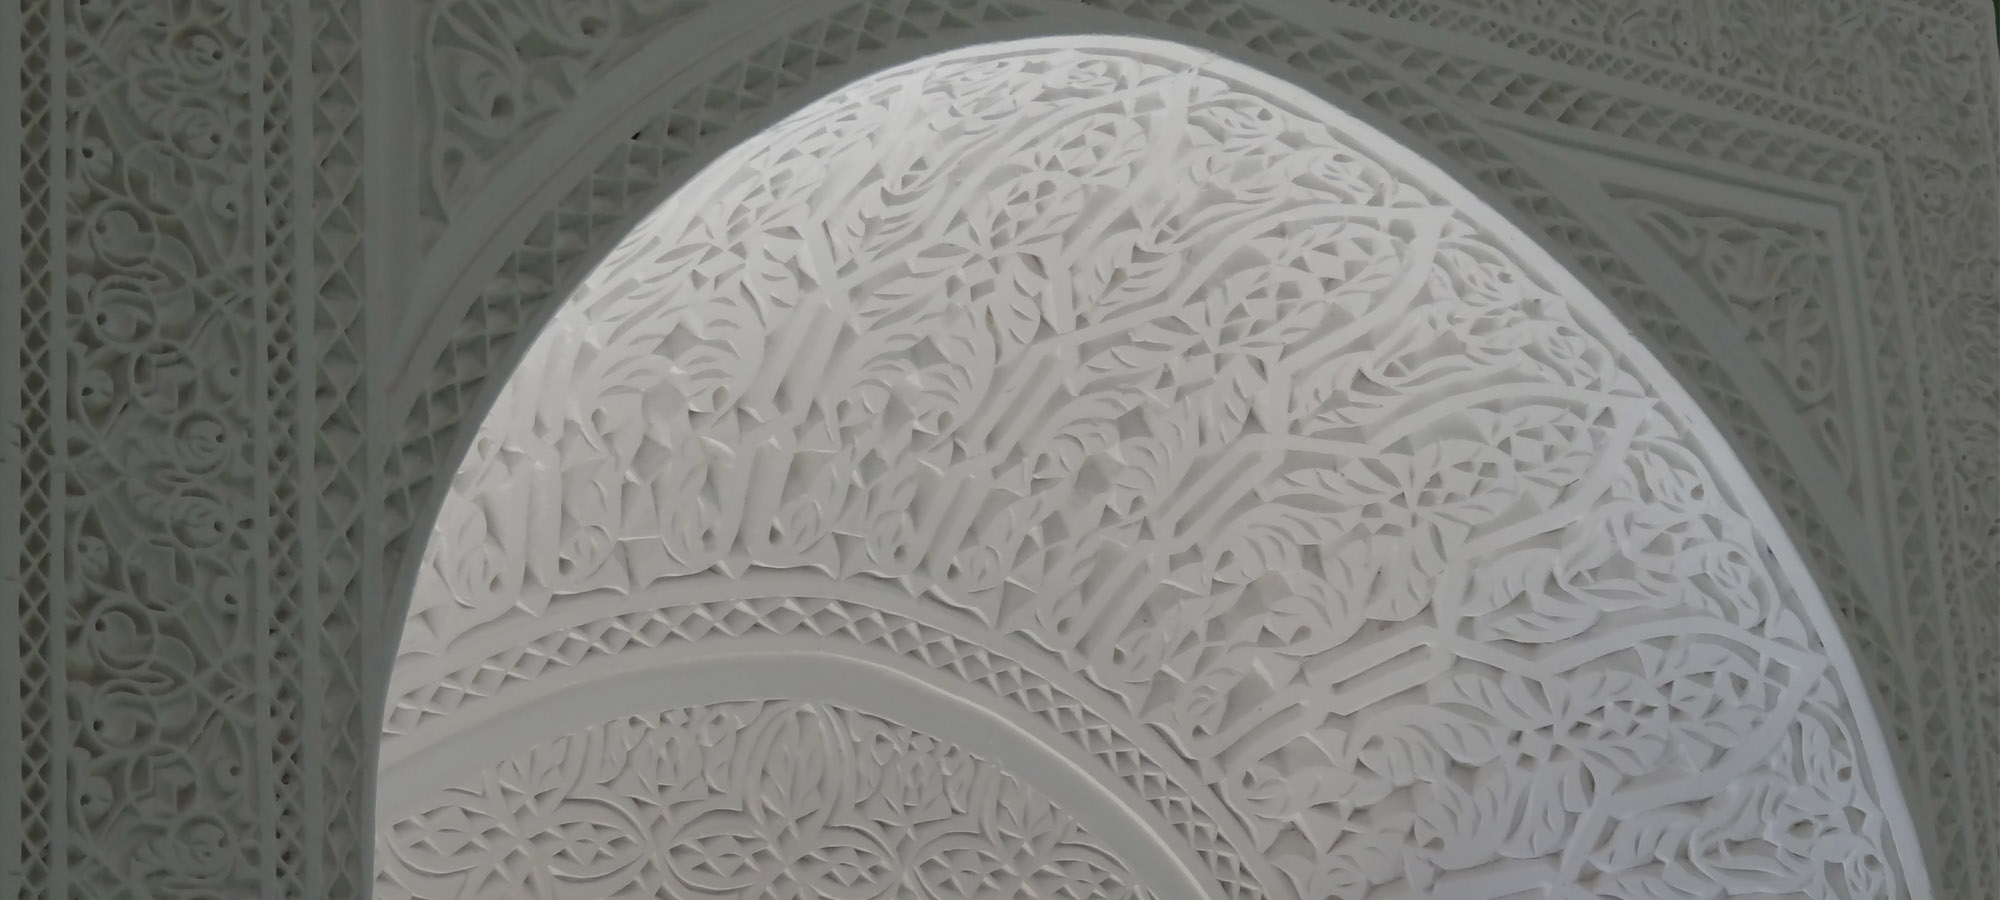 4. Akhdar Plaster Arch